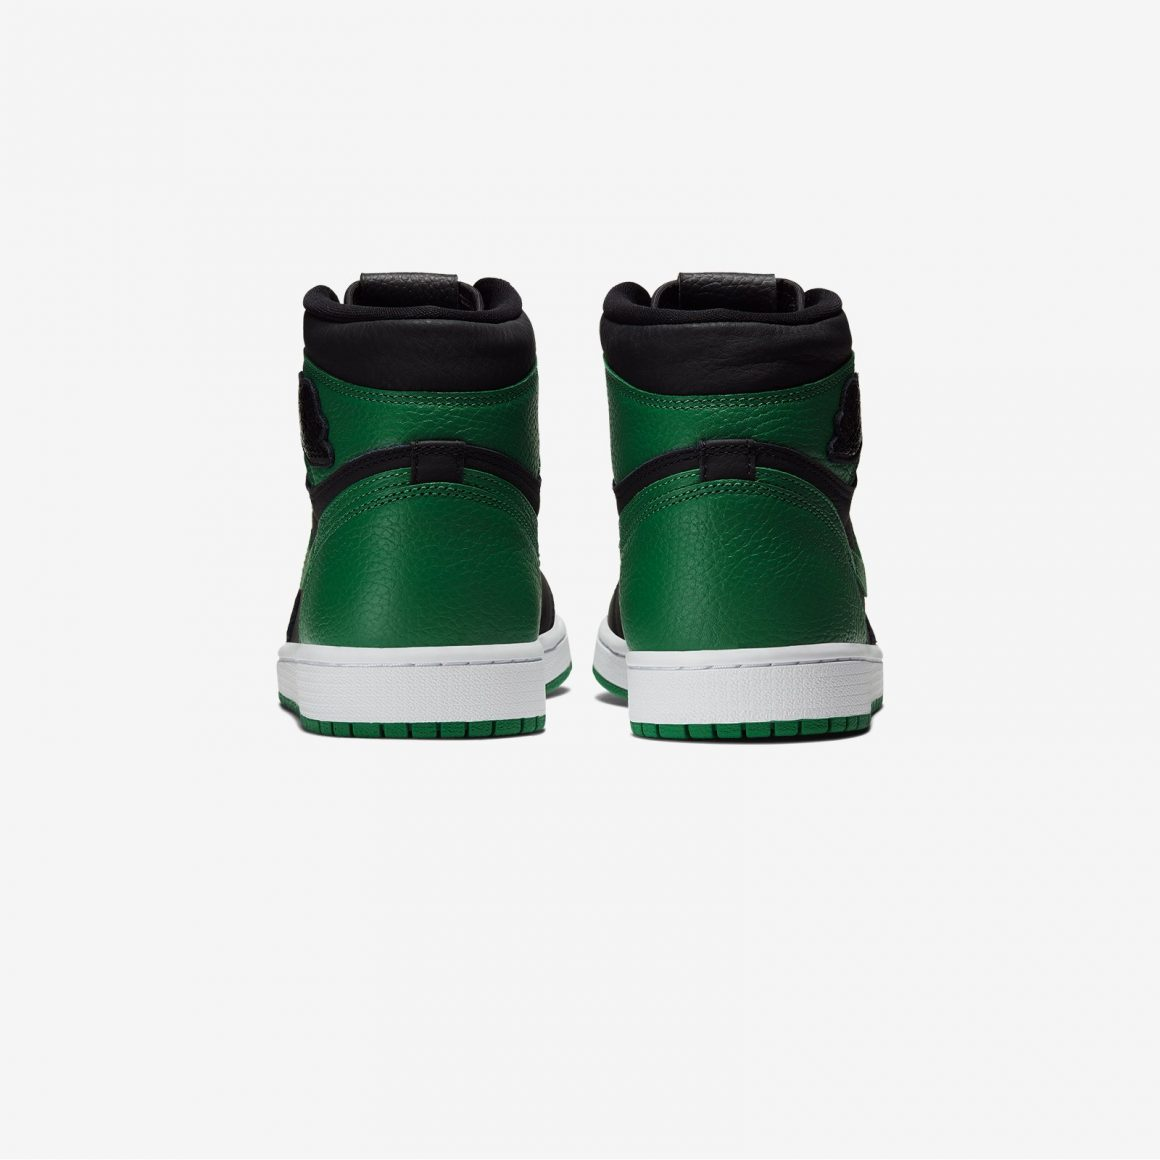 Air Jordan 1 Retro High OG ''Pine Green''